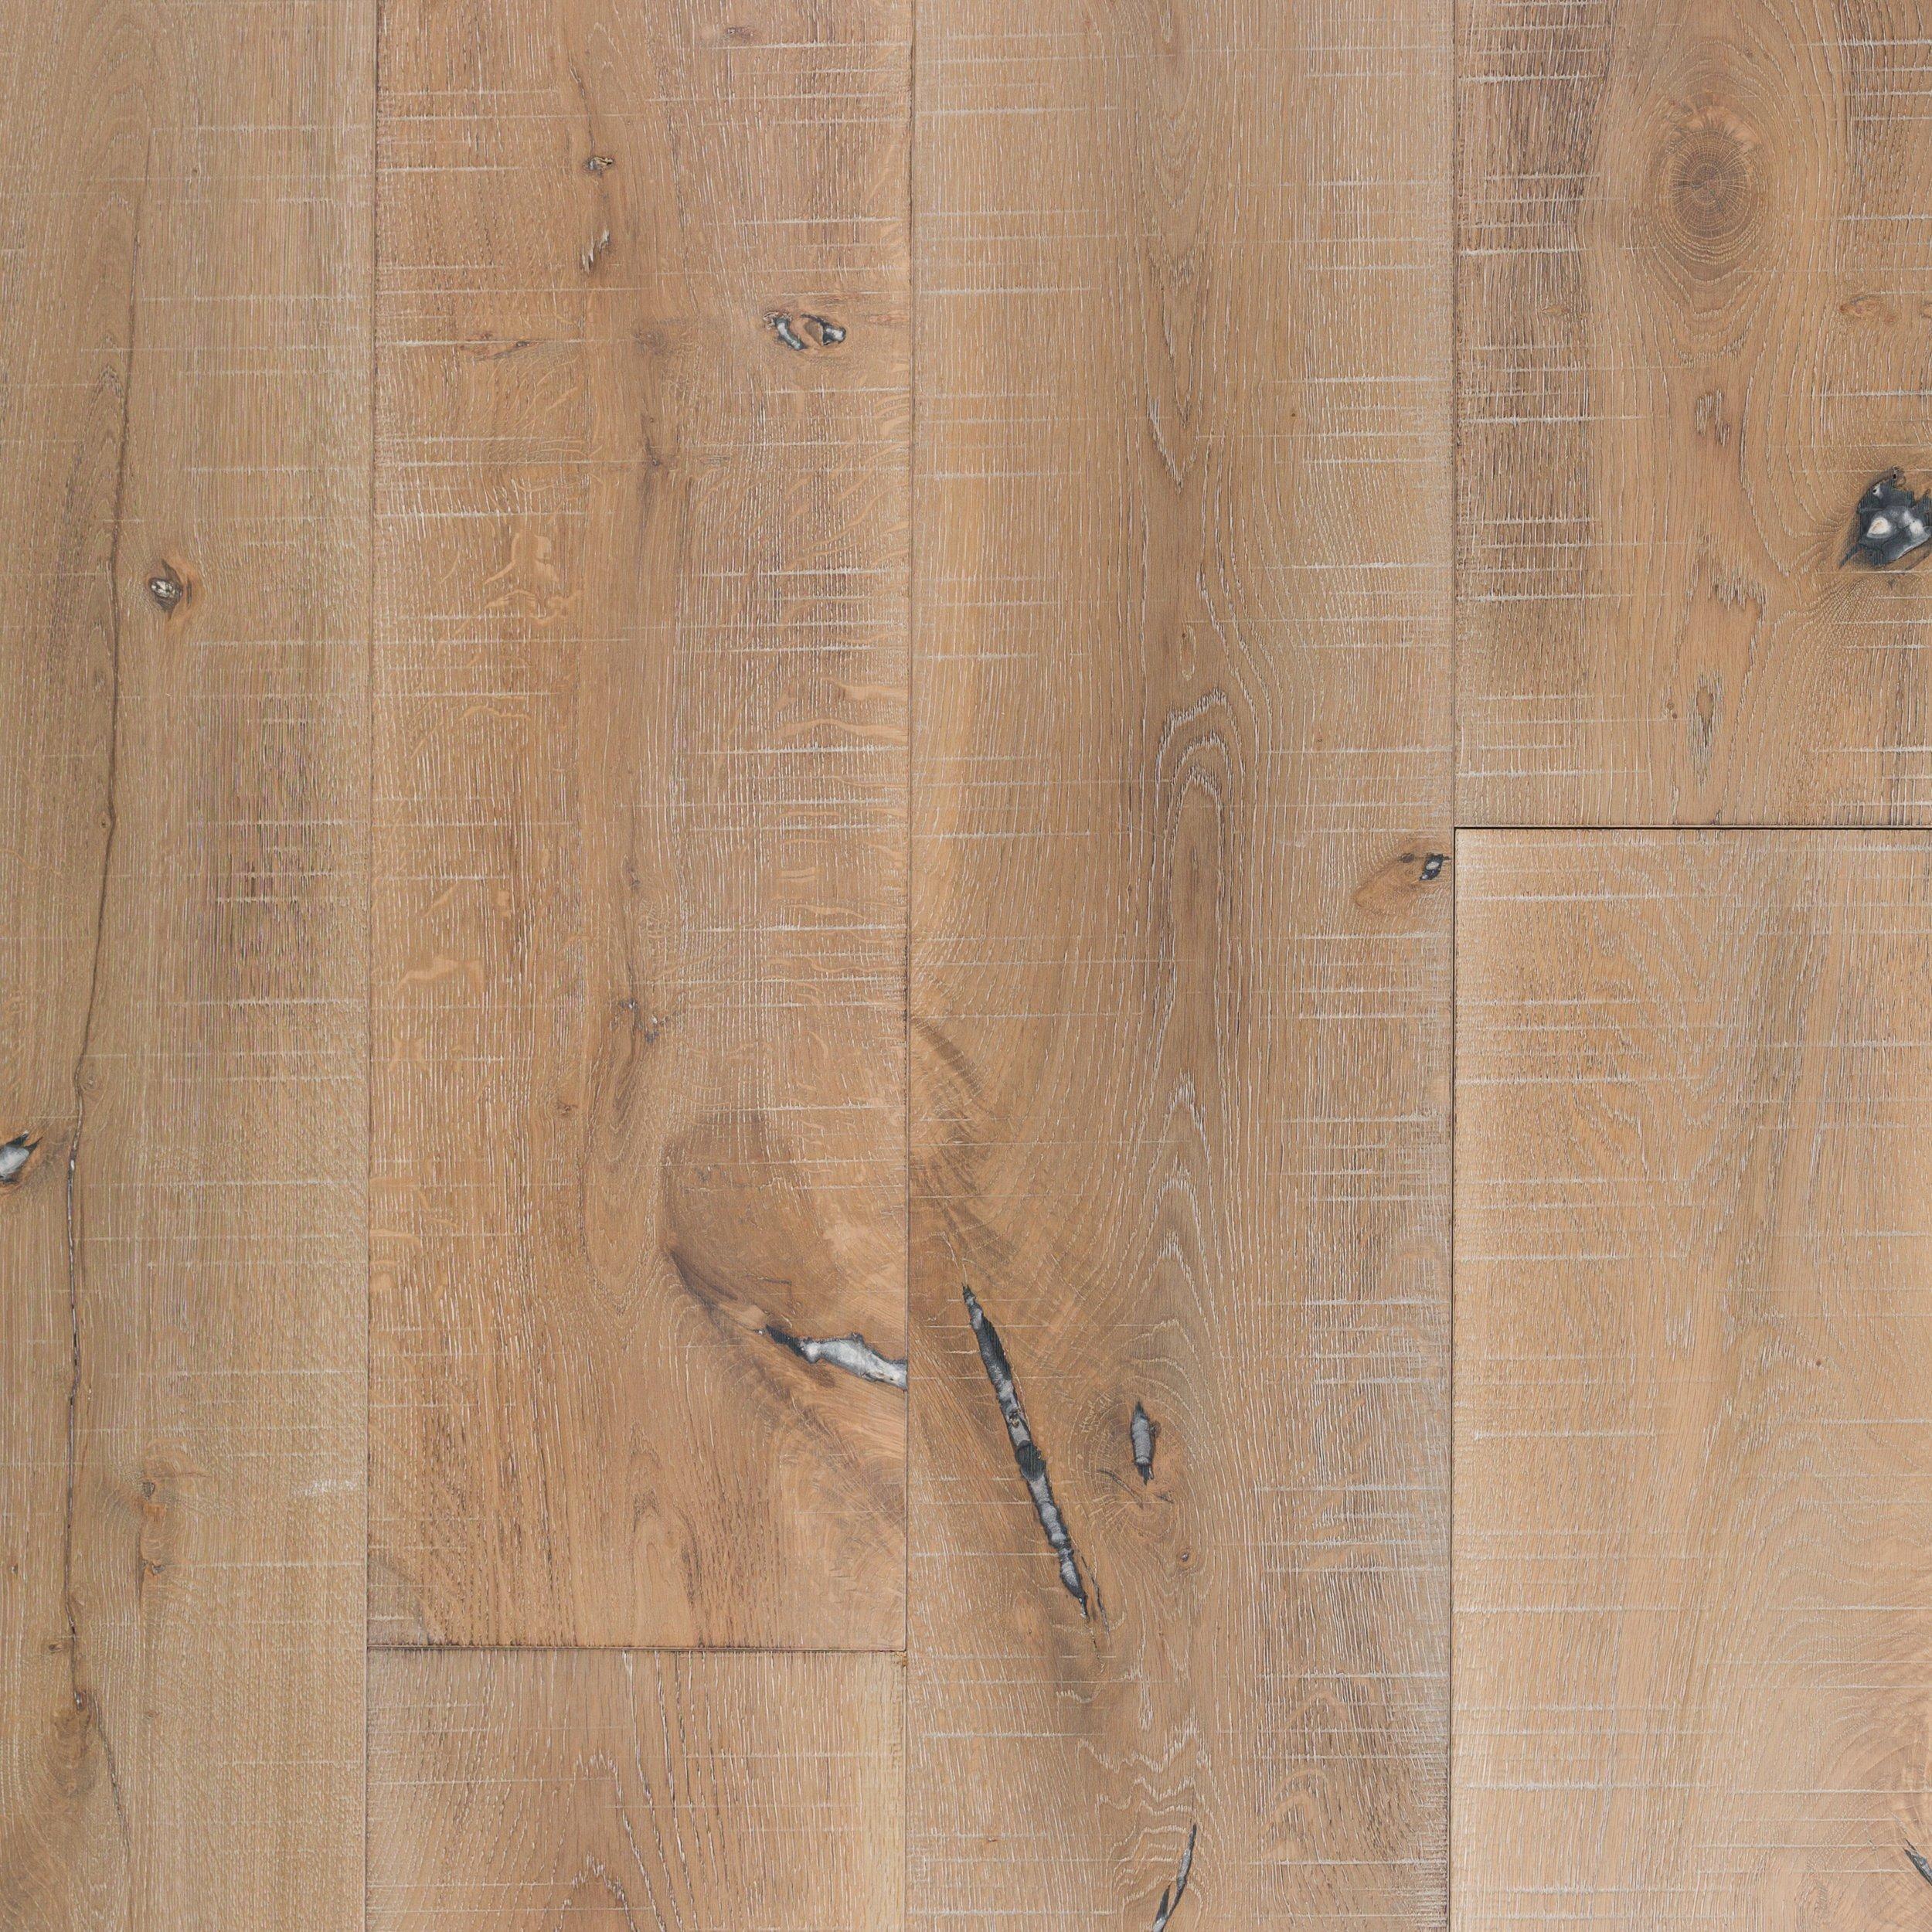 European Oak Rustic Distressed Engineered Hardwood In 2020 Wood Floors Wide Plank Engineered Hardwood Oak Hardwood Flooring